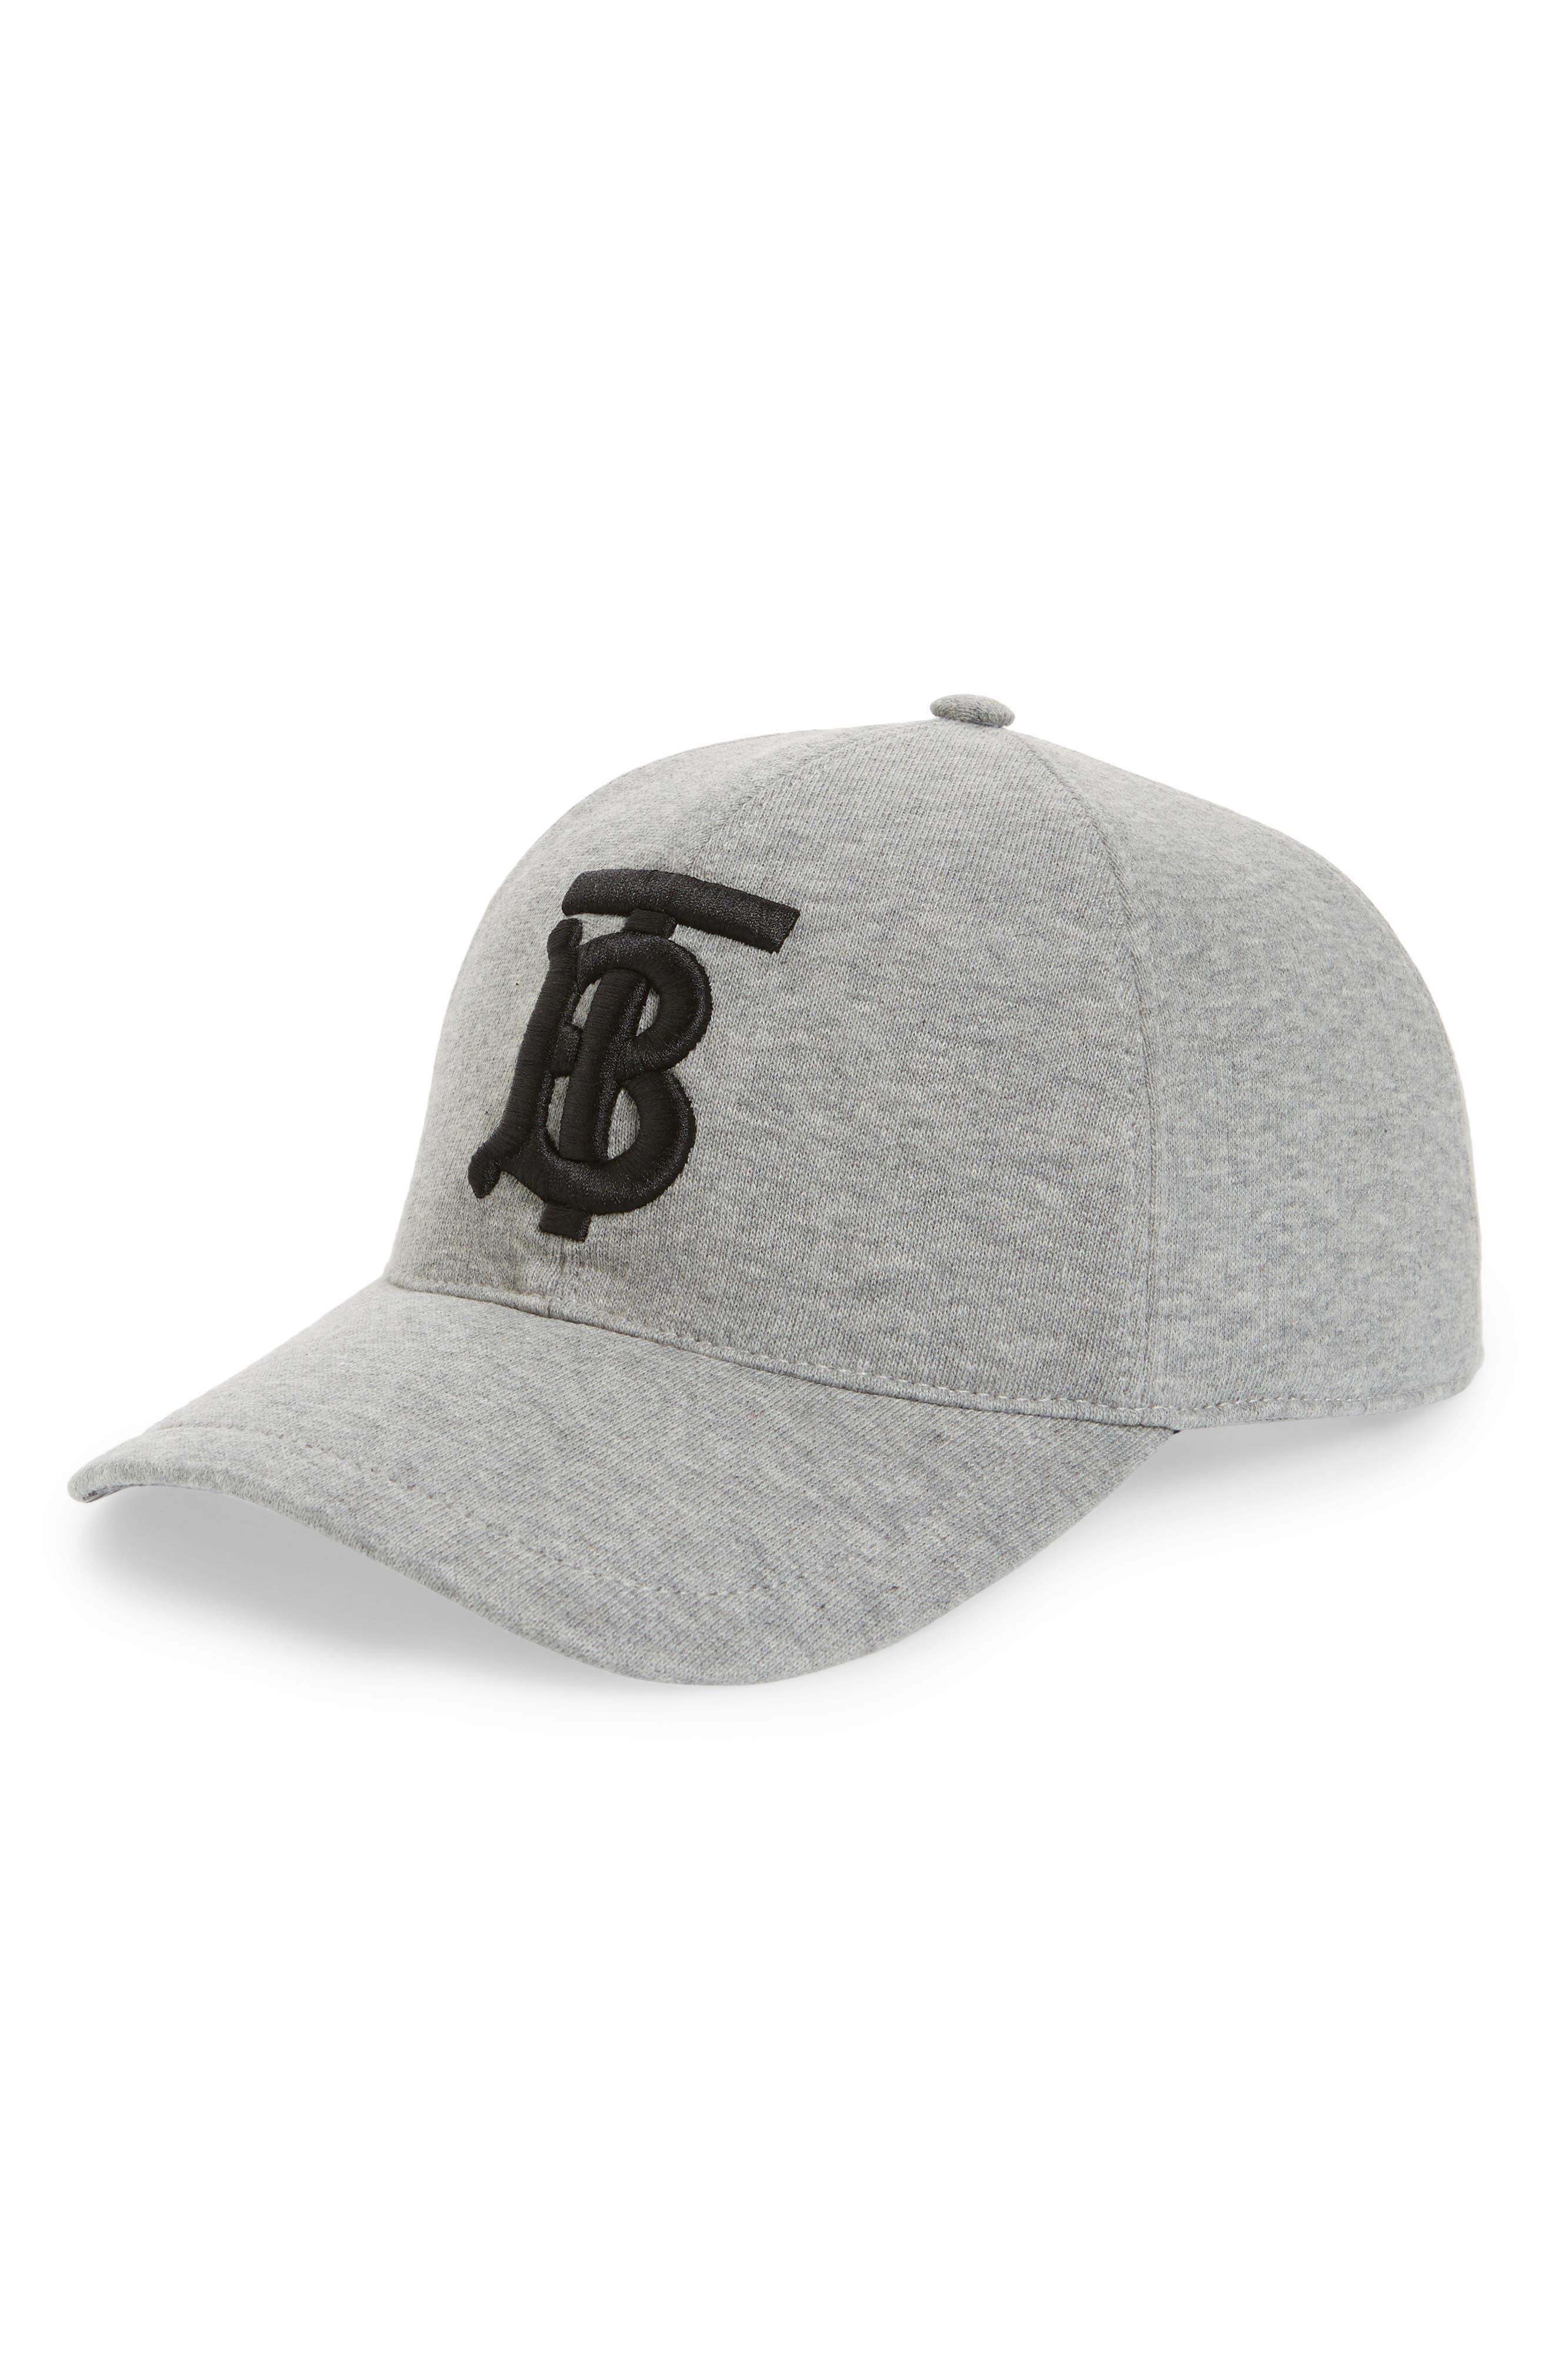 BURBERRY Jersey Baseball Cap, Main, color, LIGHT GREY MELANGE